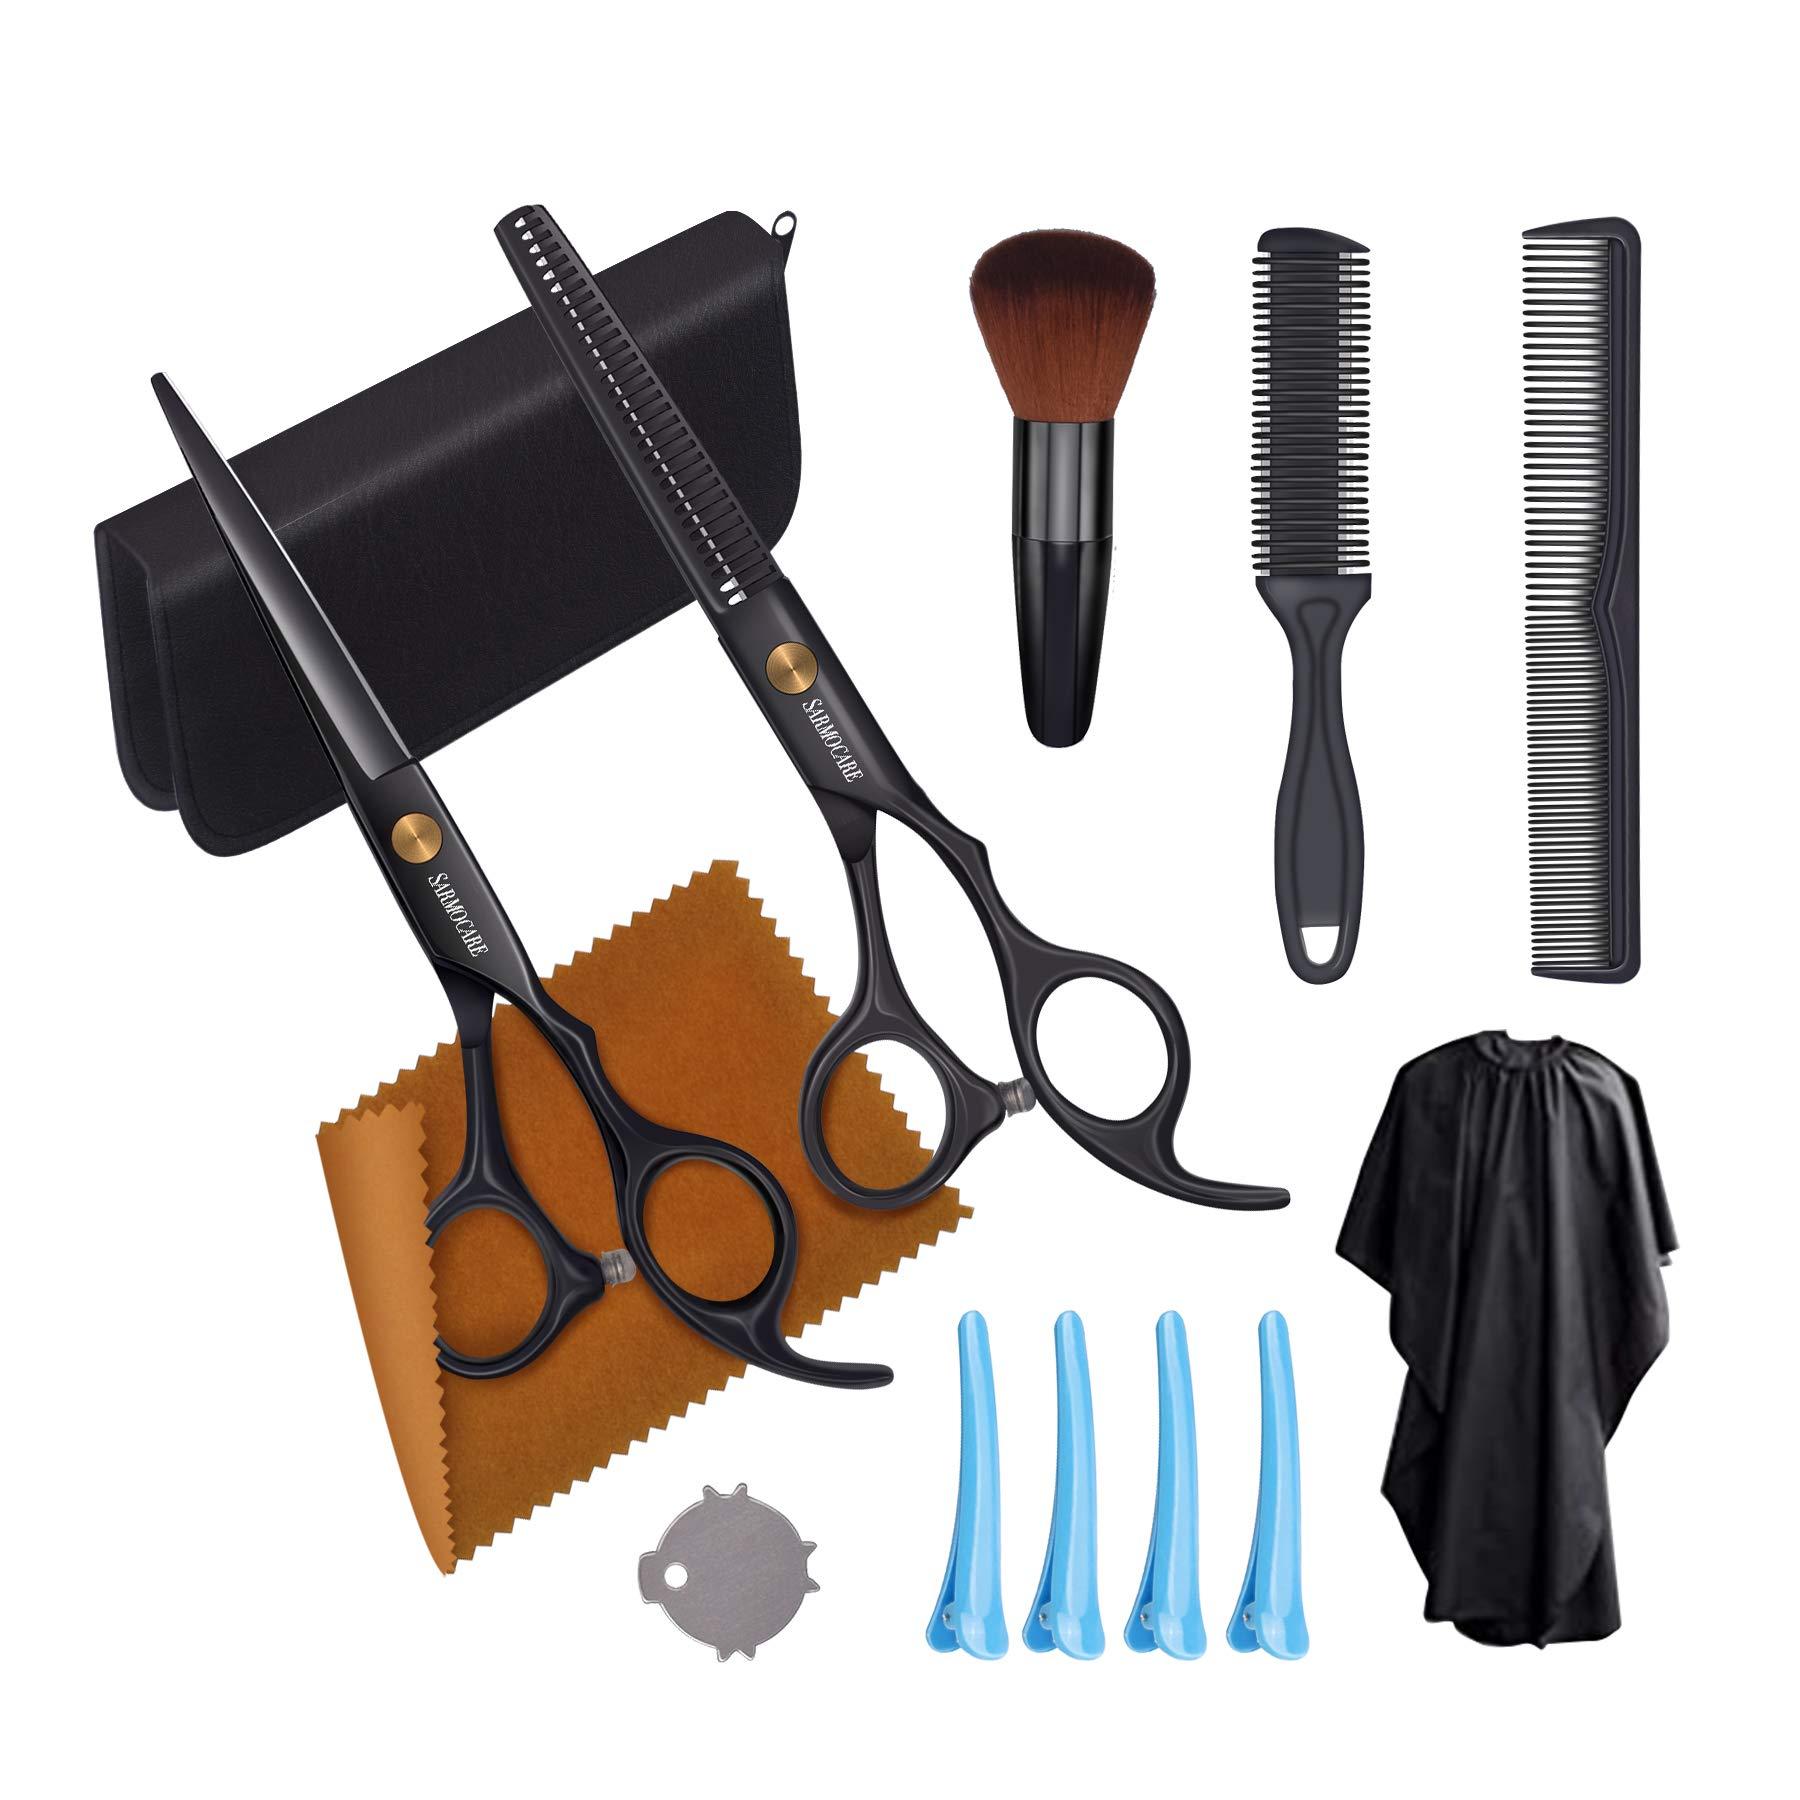 Hair Cutting Scissors Set SARMOCARE 11pcs Professional Haircut Scissors including Cutting ScissorsThinning